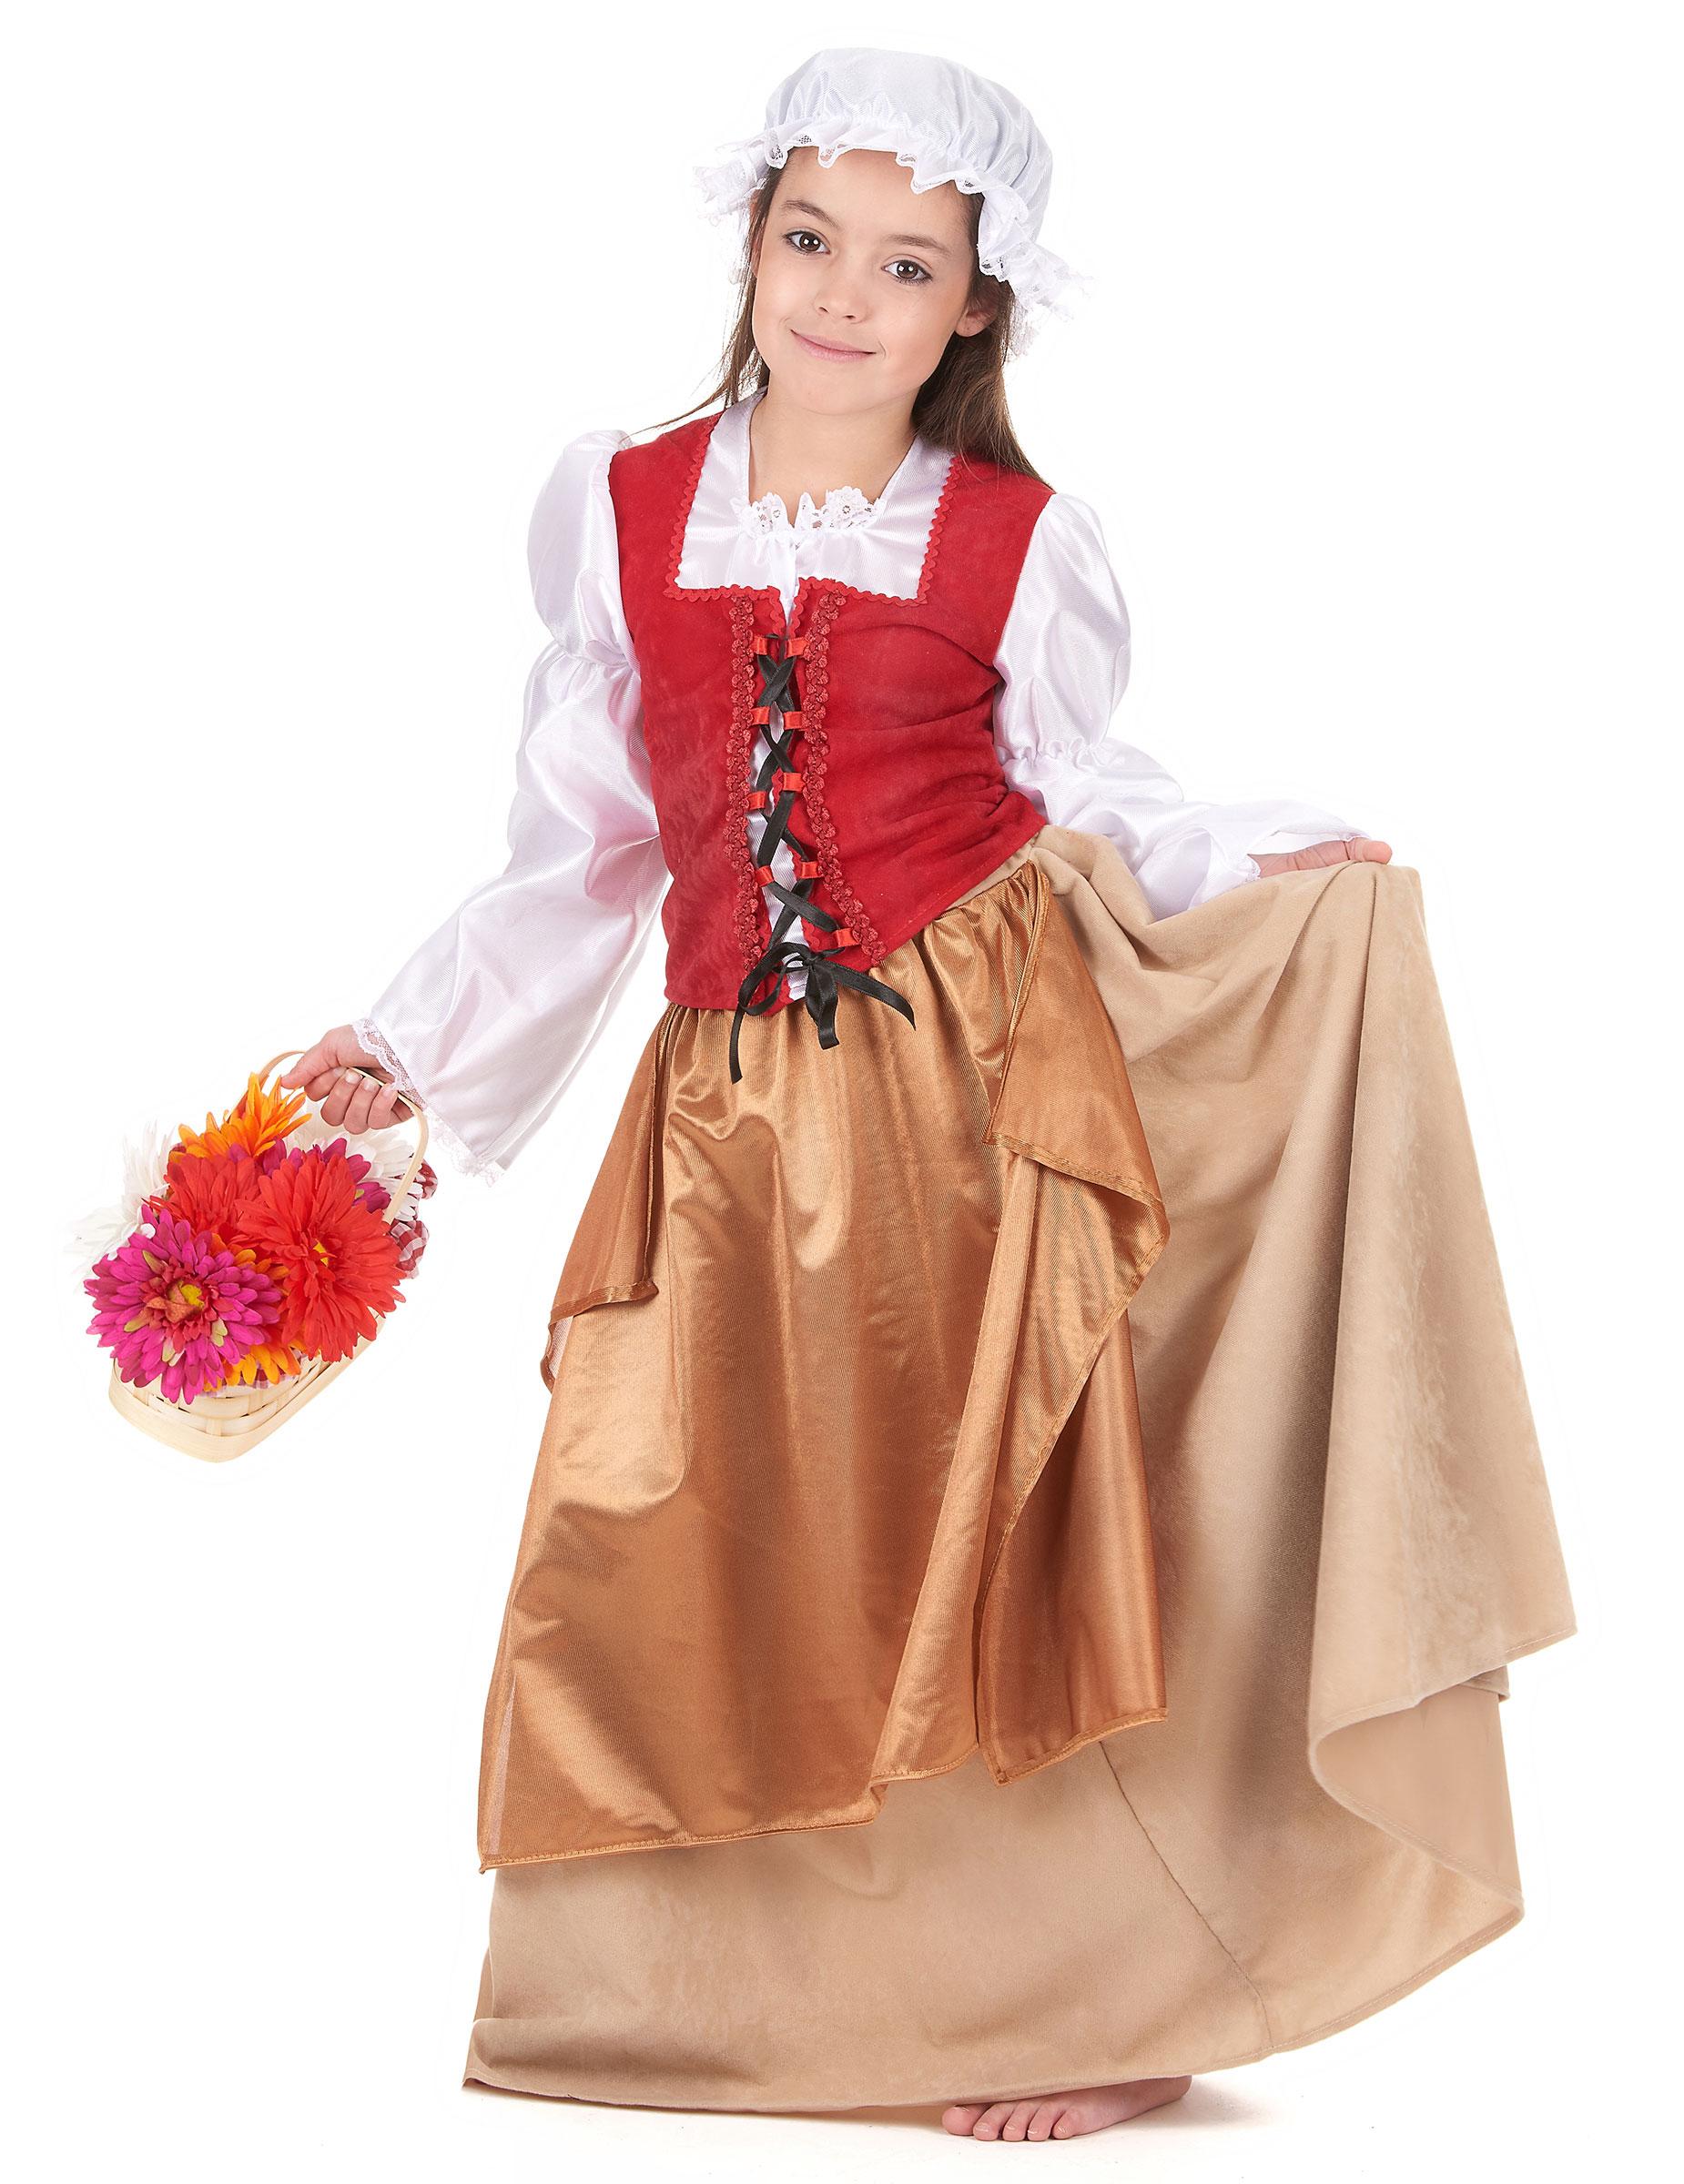 Travestimento da contadina del medioevo per bambina su VegaooParty ... bf24f33d117